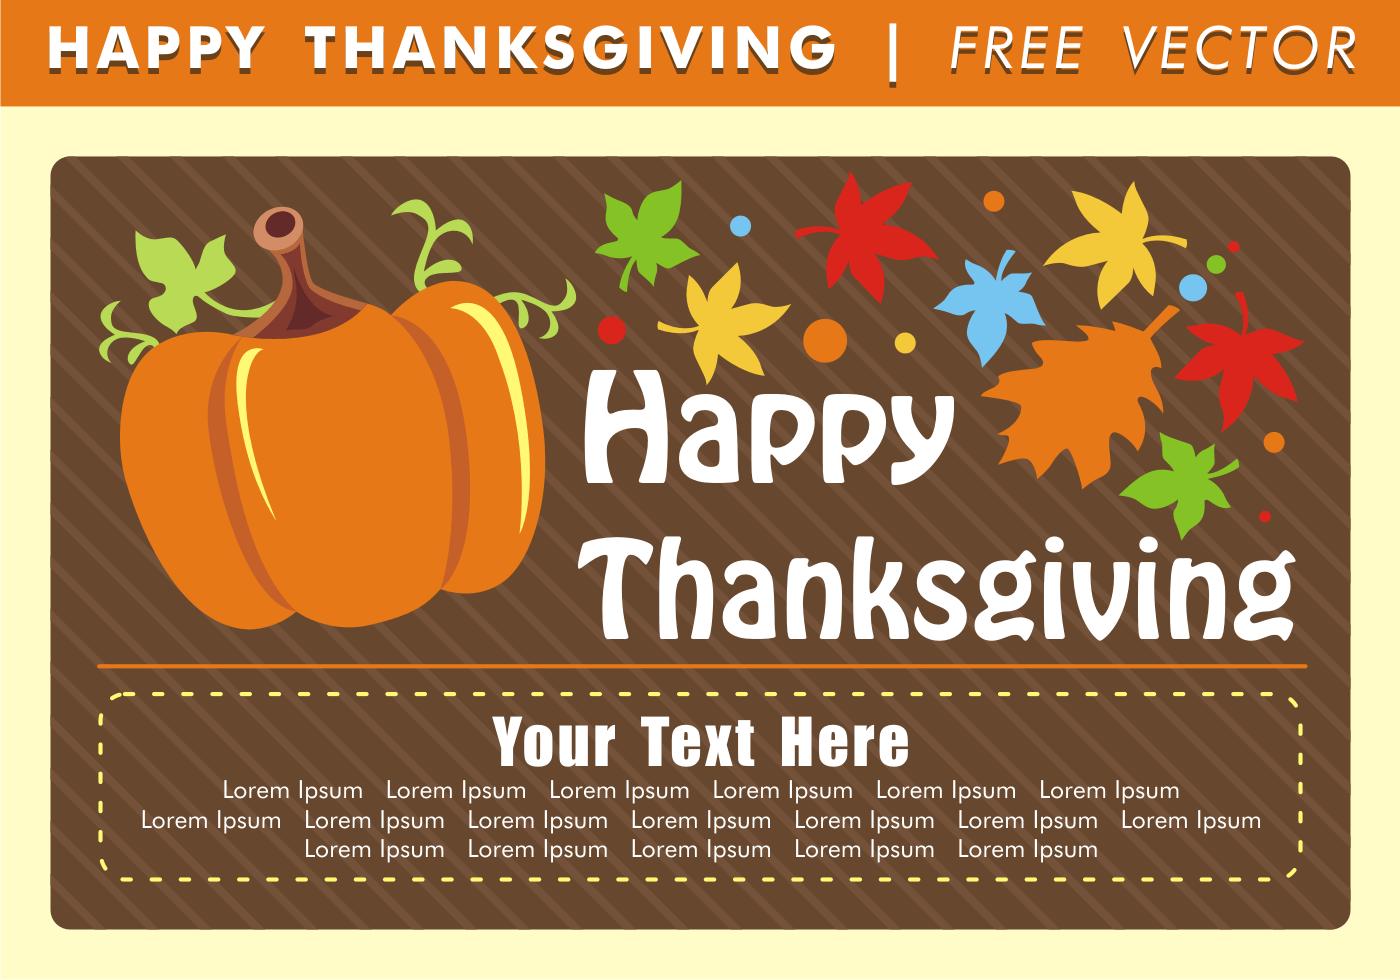 Thanksgiving images free